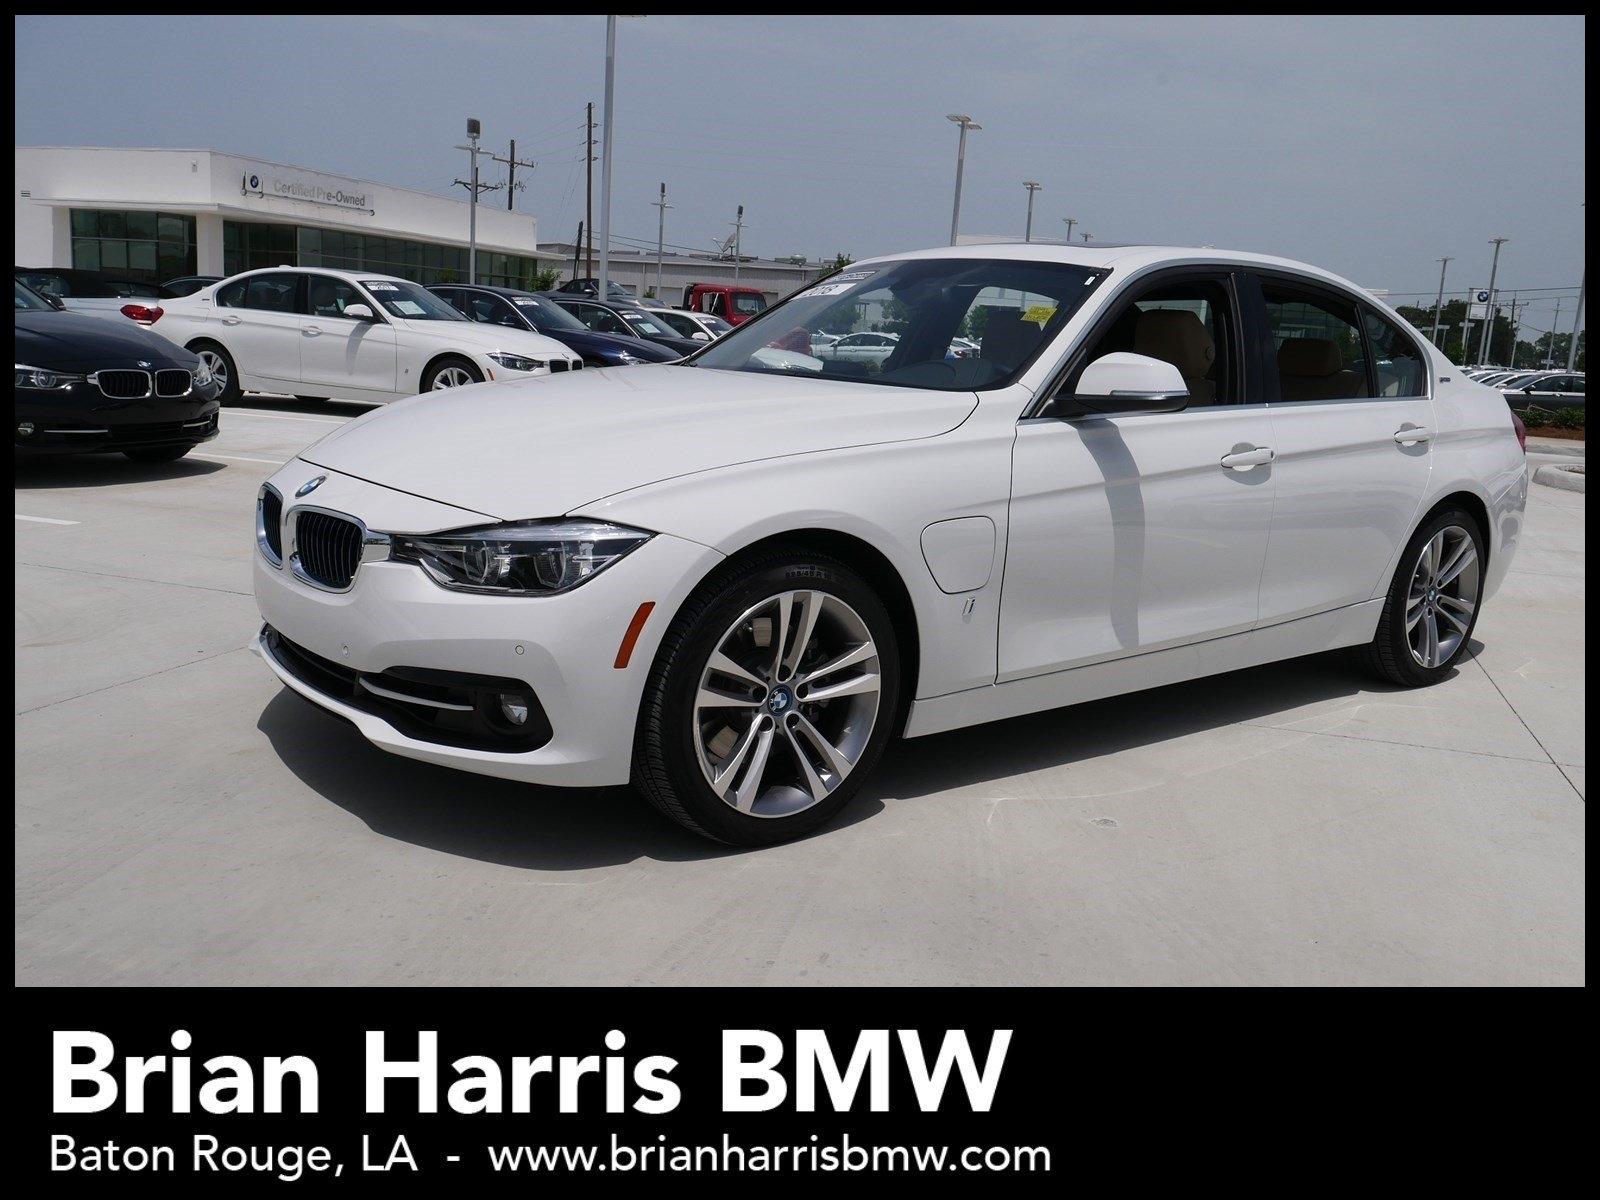 Used 2018 BMW 3 Series 330e iPerformance in Baton Rouge LA Brian Harris BMW